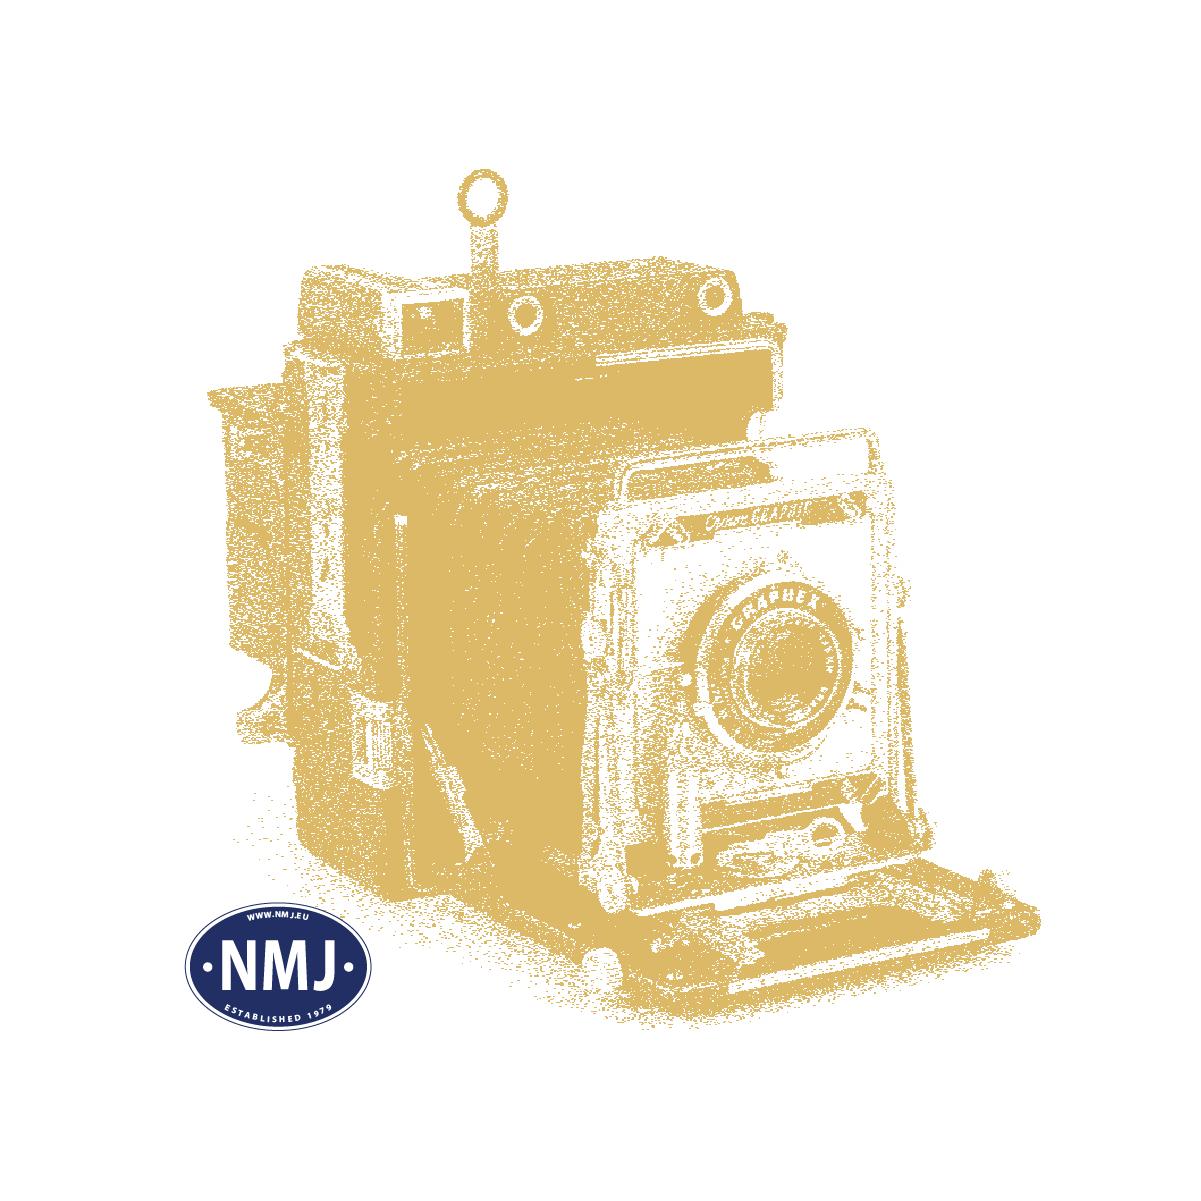 MWB-P243 - Gresstuster, Sen Sommer, 21 x 15 Cm